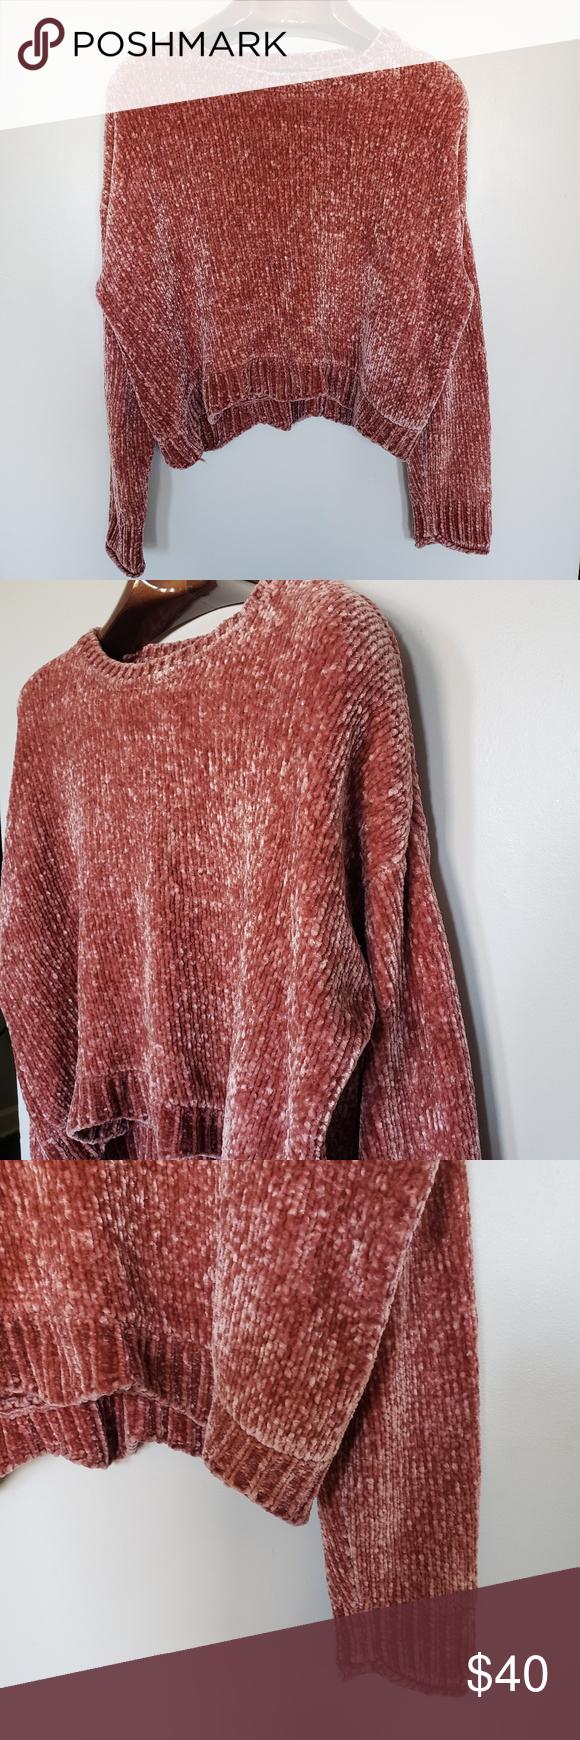 "Zara // soft knit chenille cropped • S i z e R e f e r e n c e • -Model: 5""2 • D e t a i l s •  -Condition: Great!  ⚜ Vtg is pre-loved..."